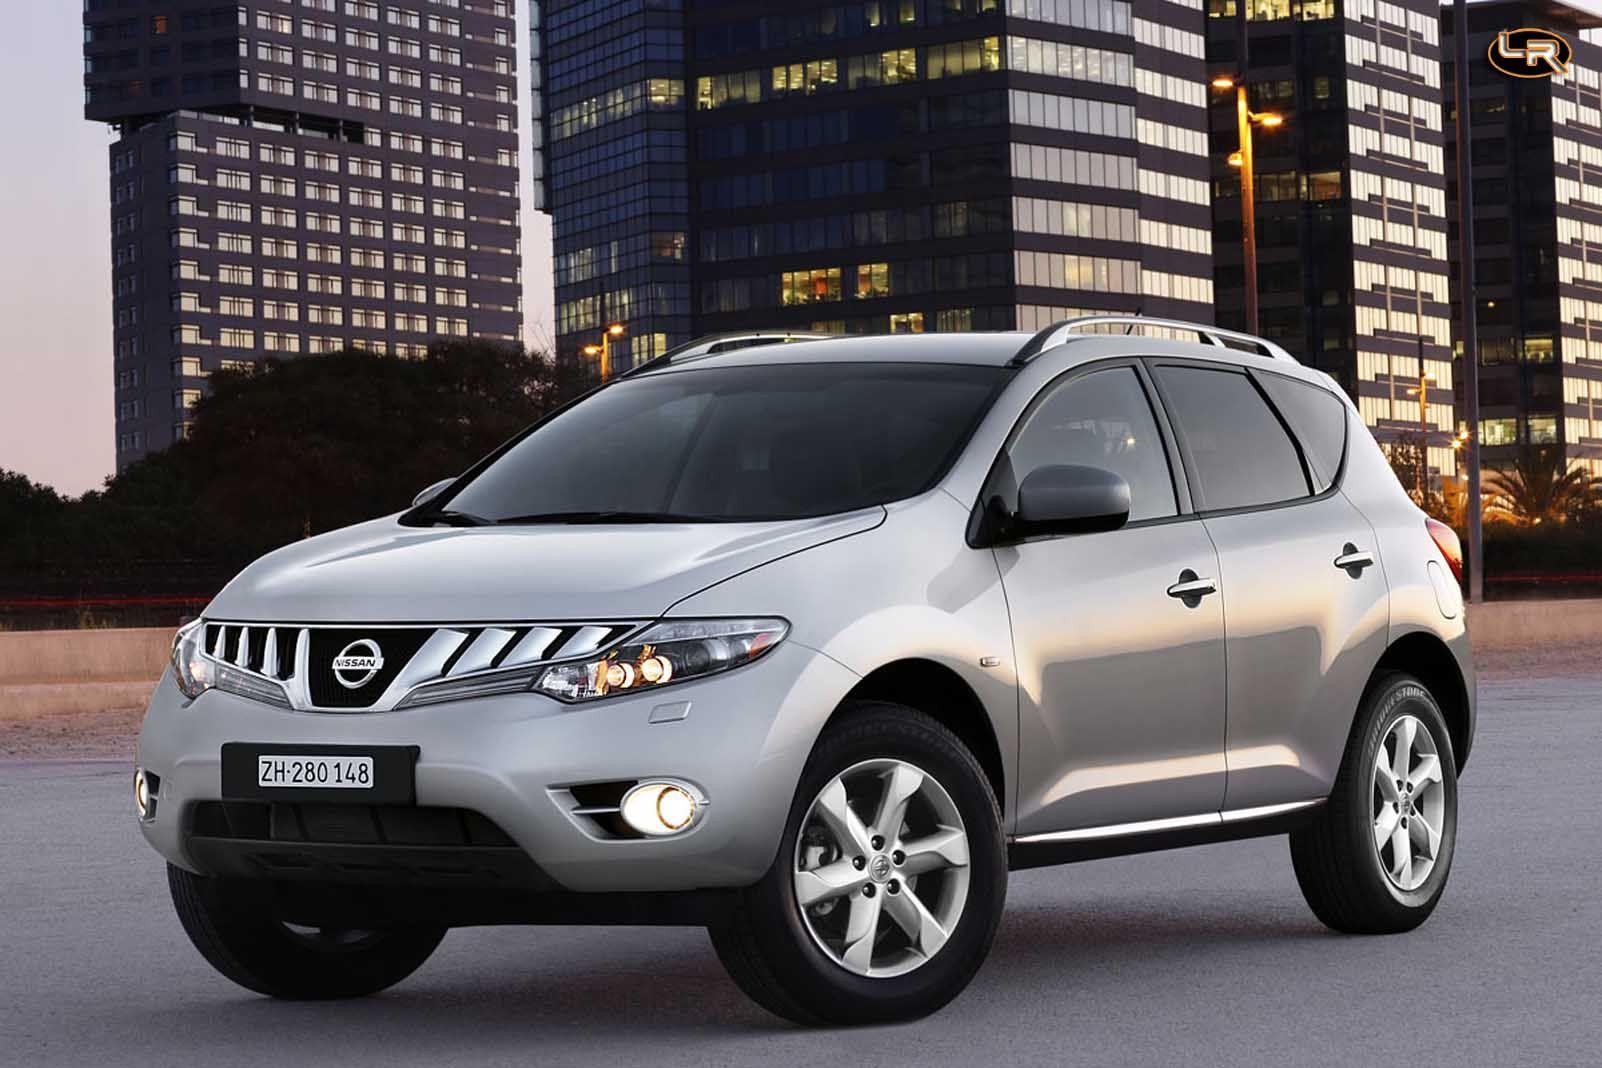 Nissan murano ii photos 29 photos vues exterieures interieur nissan free download